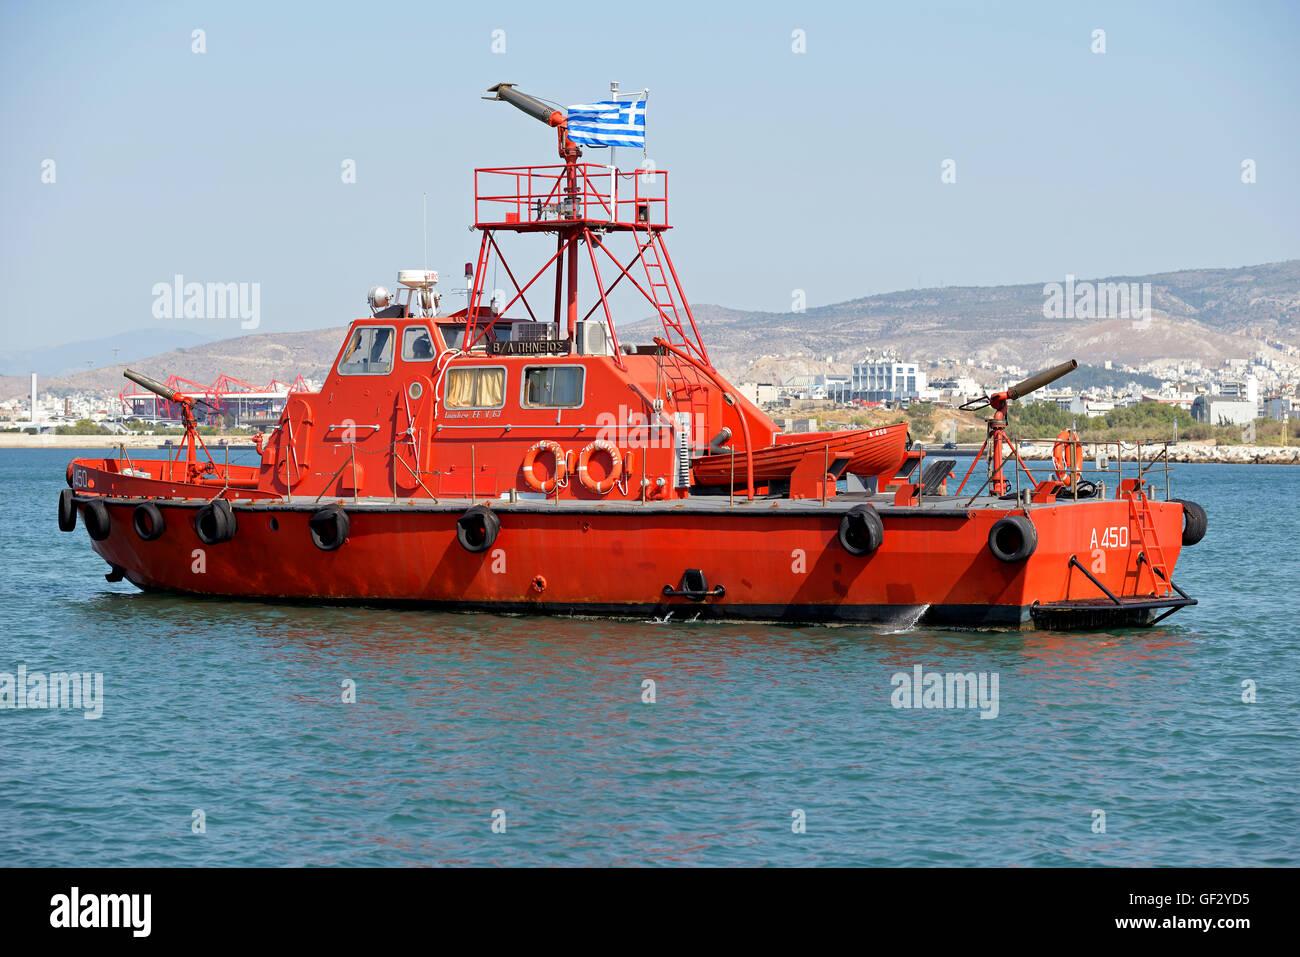 ... Array - fire fighting vessel stock photos u0026 fire fighting vessel  stock rh alamy com